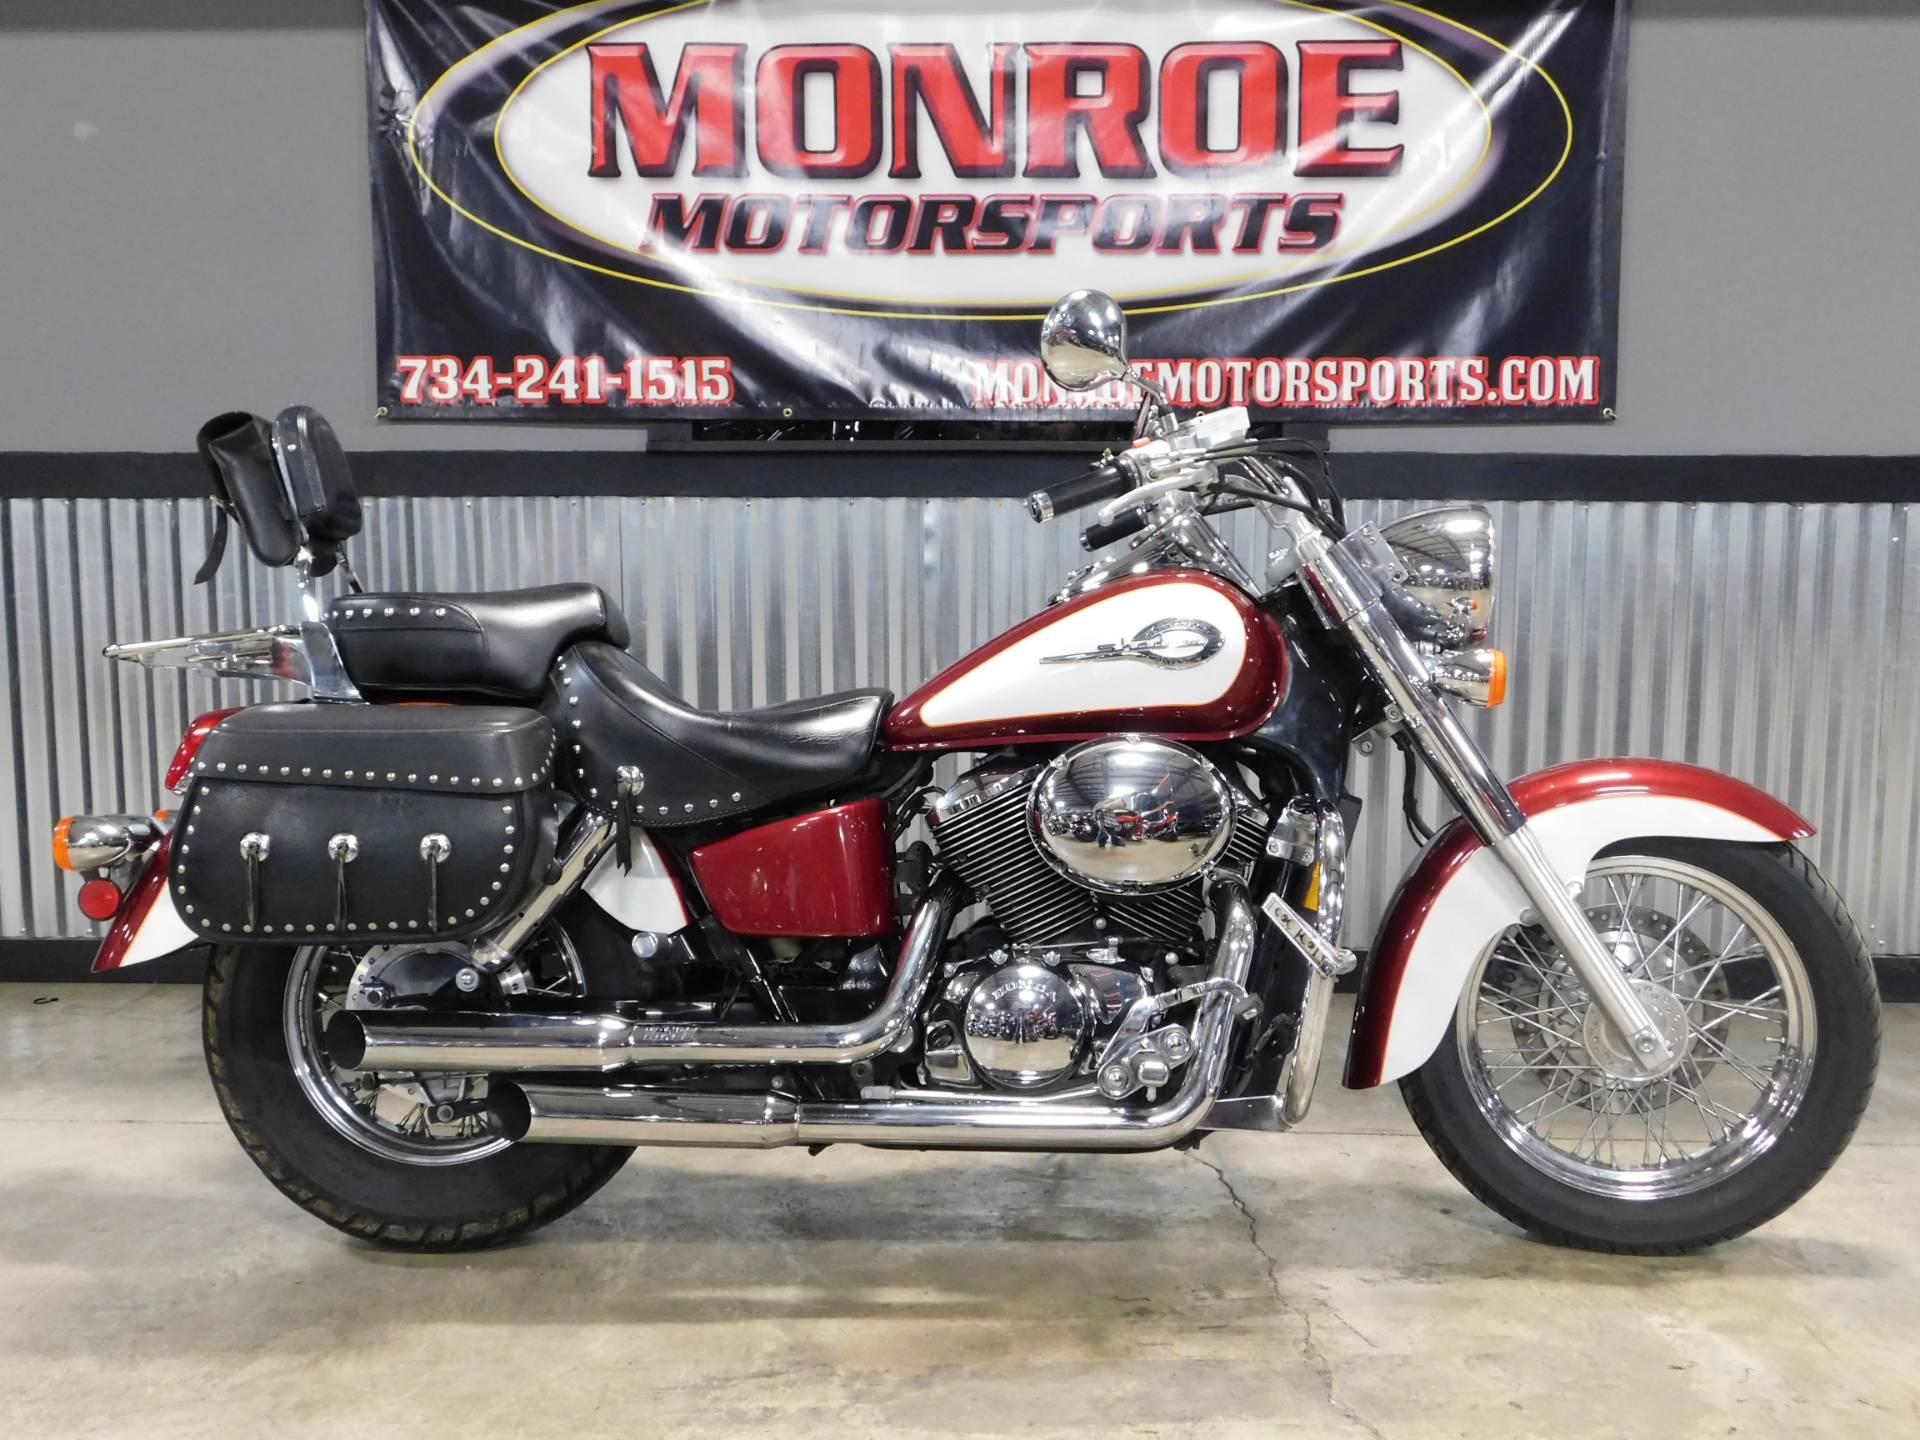 2001 Honda Shadow Aero Motorcycles Monroe Michigan HM504615